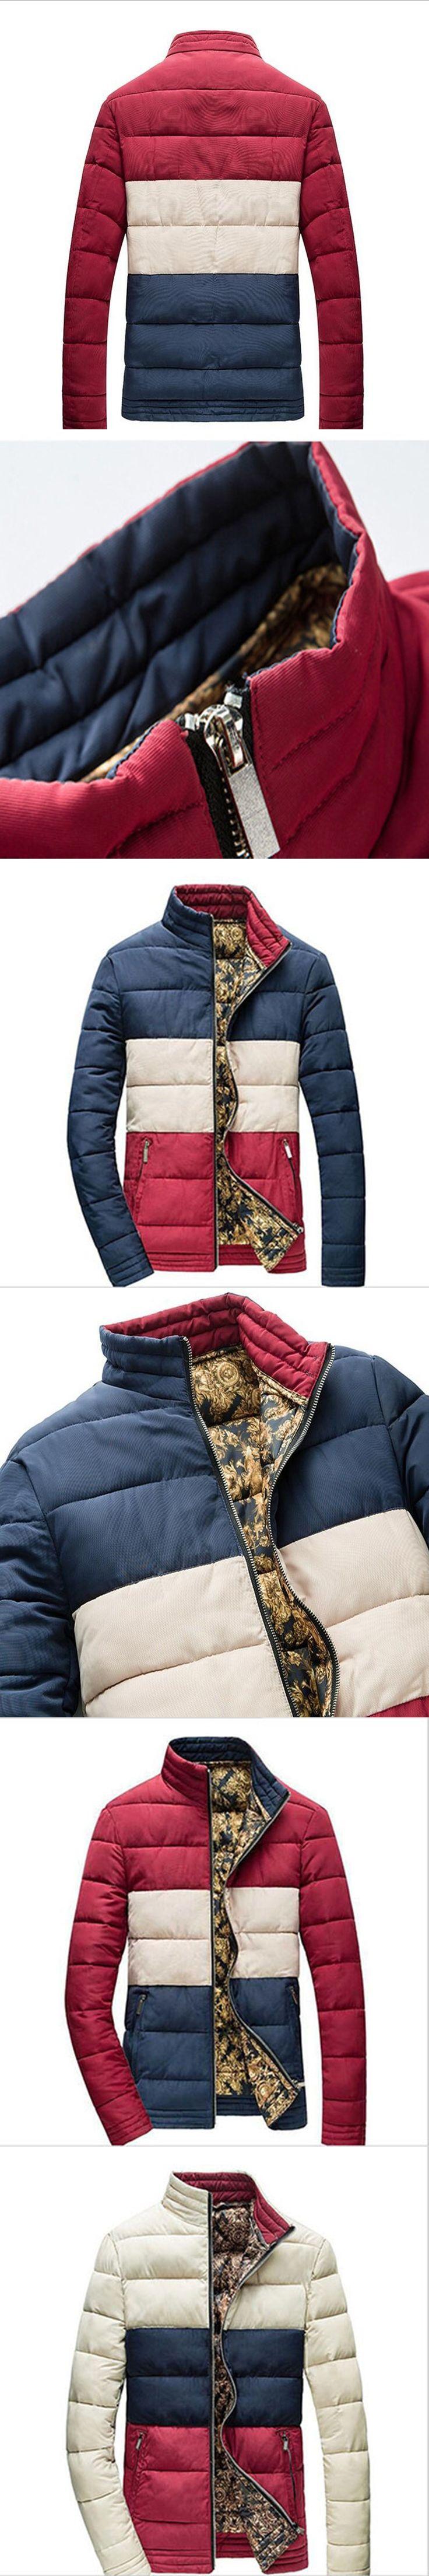 2016 winter new men's ultra-thin models down jacket men short paragraph Men's thin coat collar section